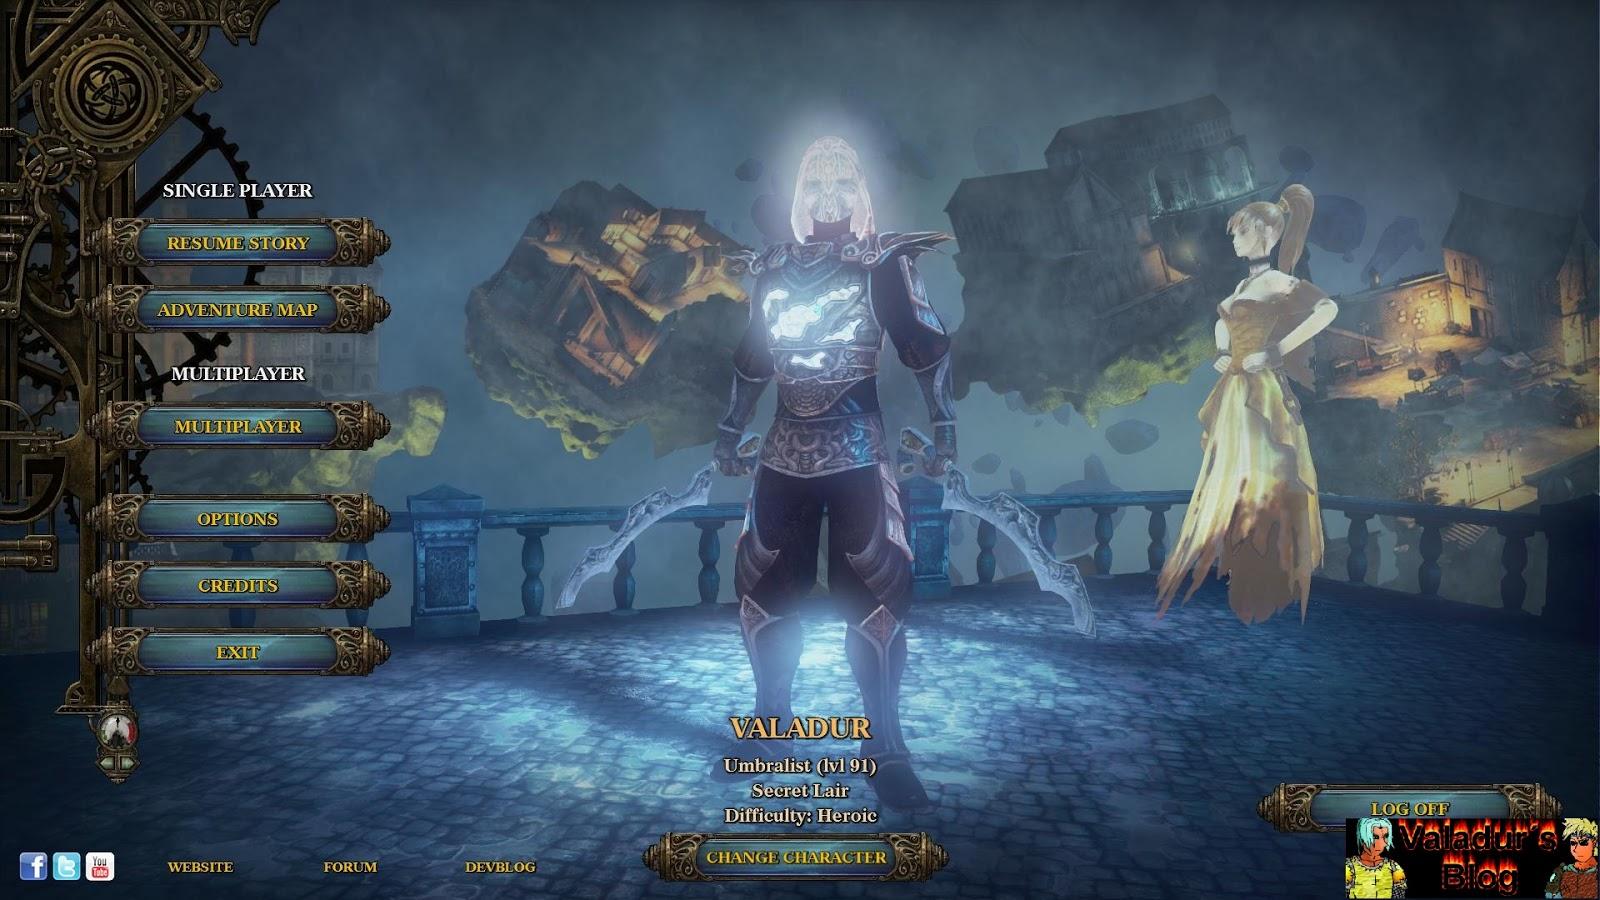 Adventures Of Van Helsing Final Cut hell gates 2 - valadur´s blog: review: the incredible